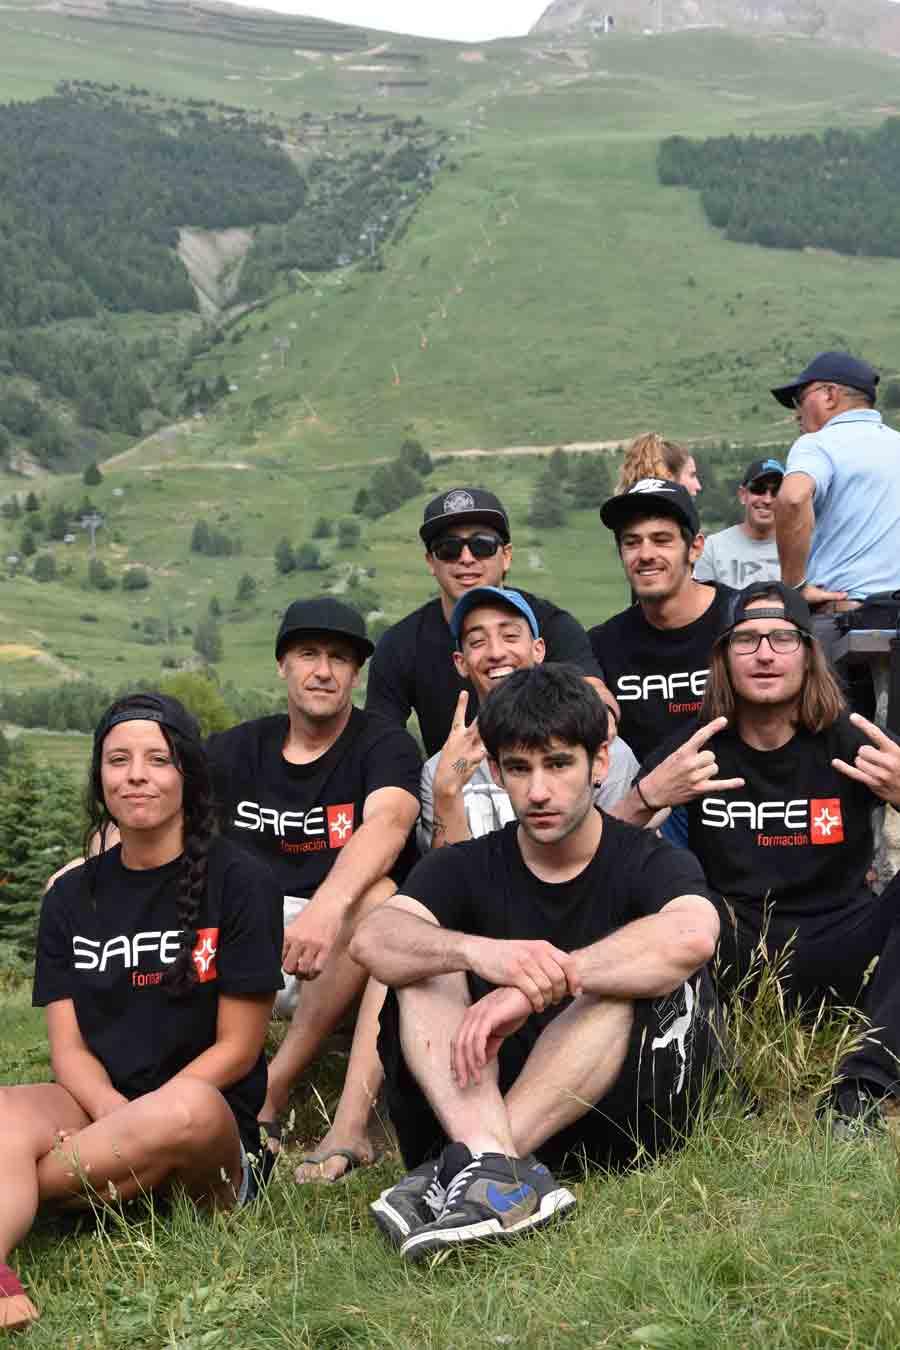 safe_formacion-tecnico_deportivo_nivel_1-esqui_alpino-les_deux_alpes-verano2018-img-7